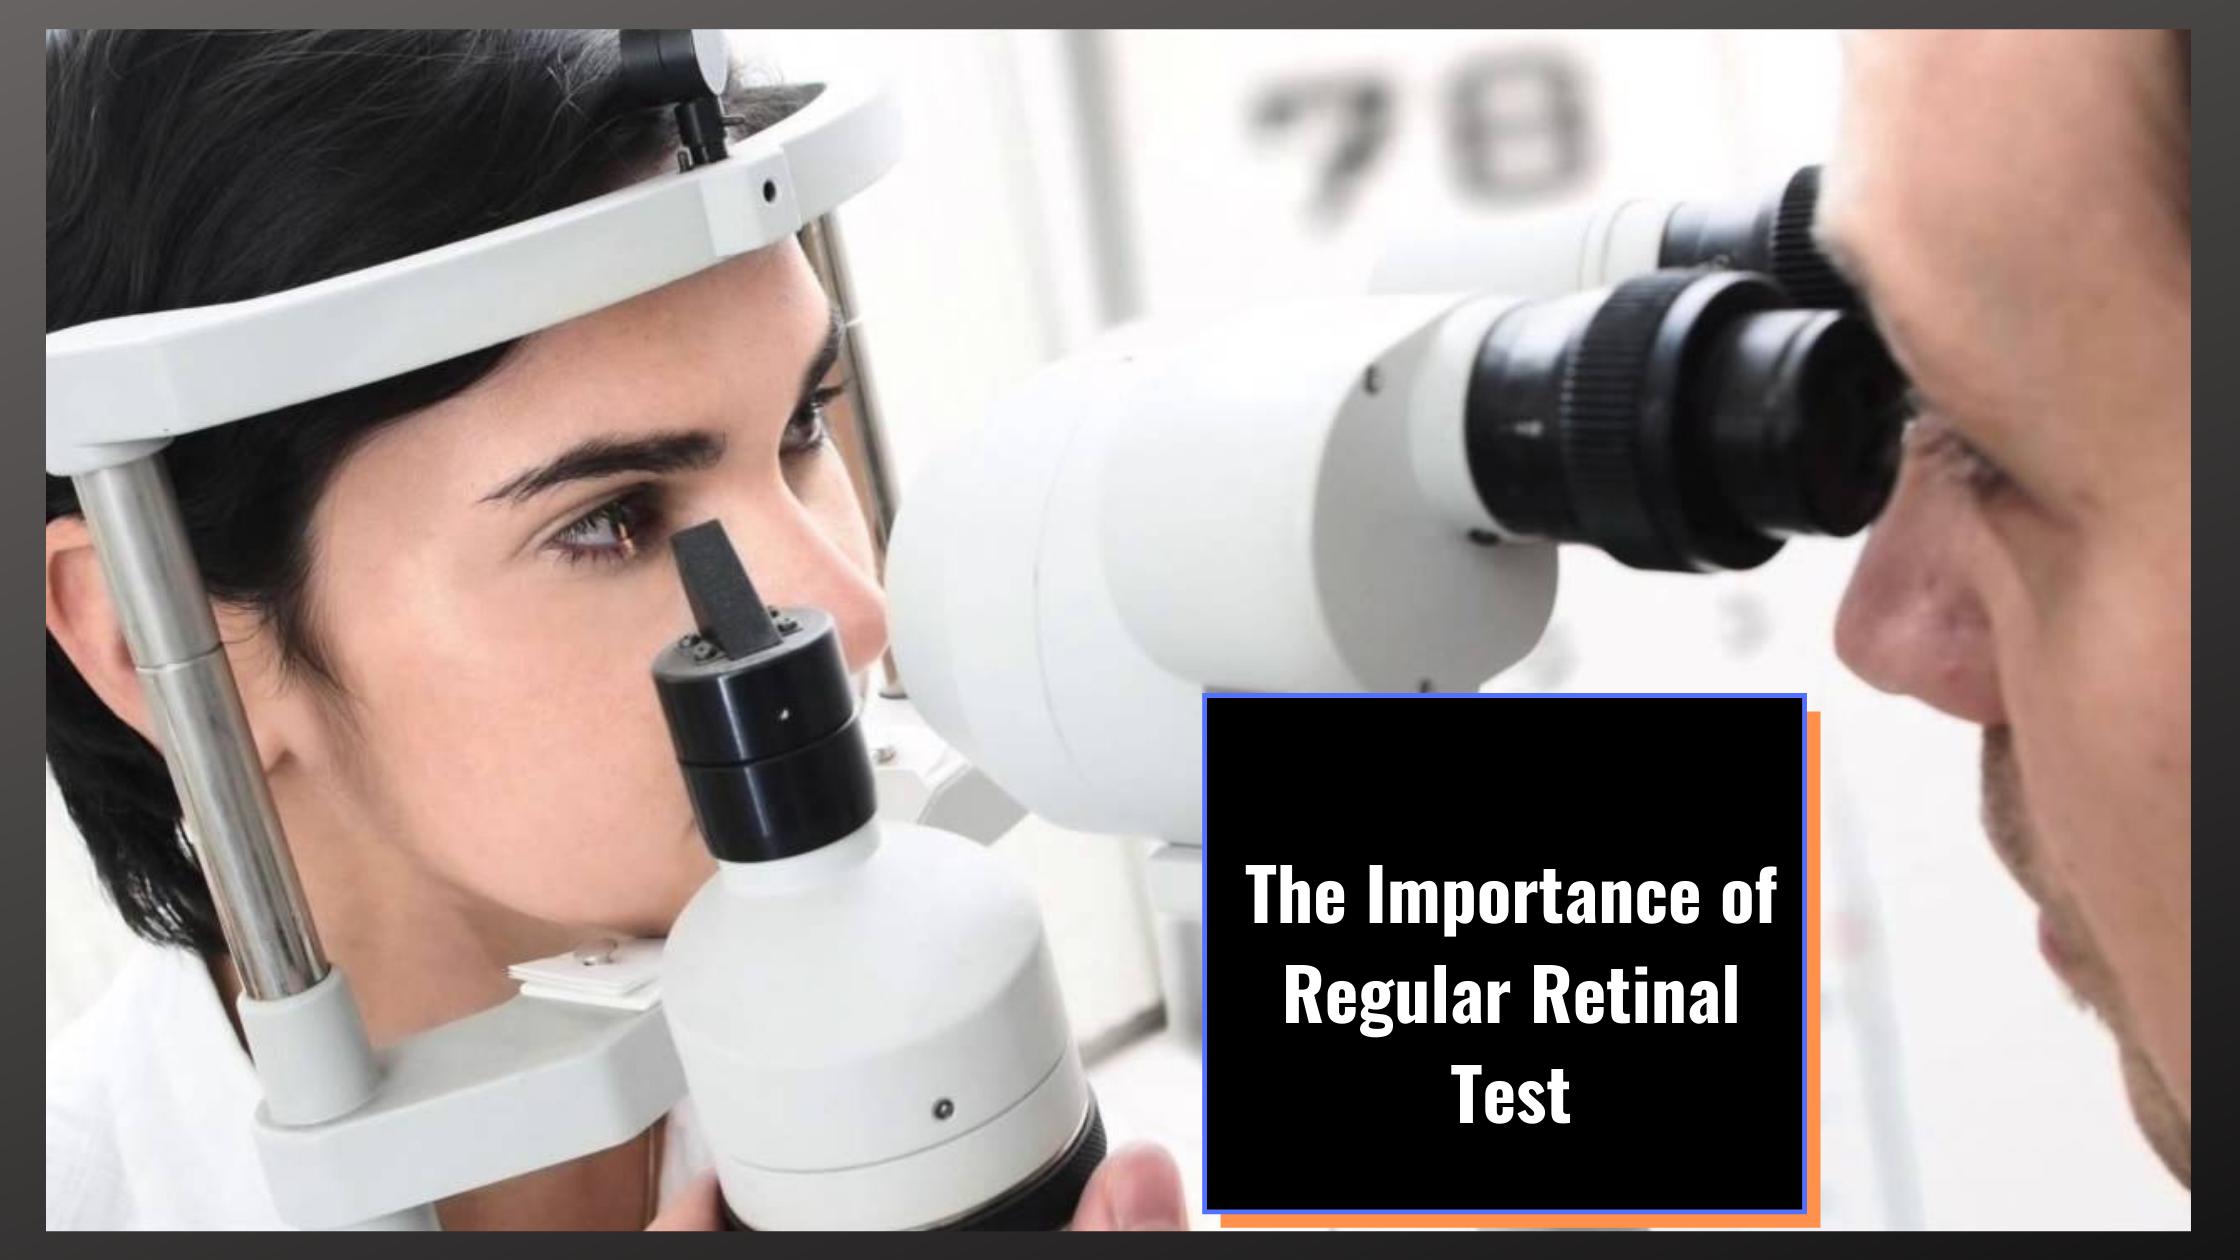 The Importance of Regular Retinal Test